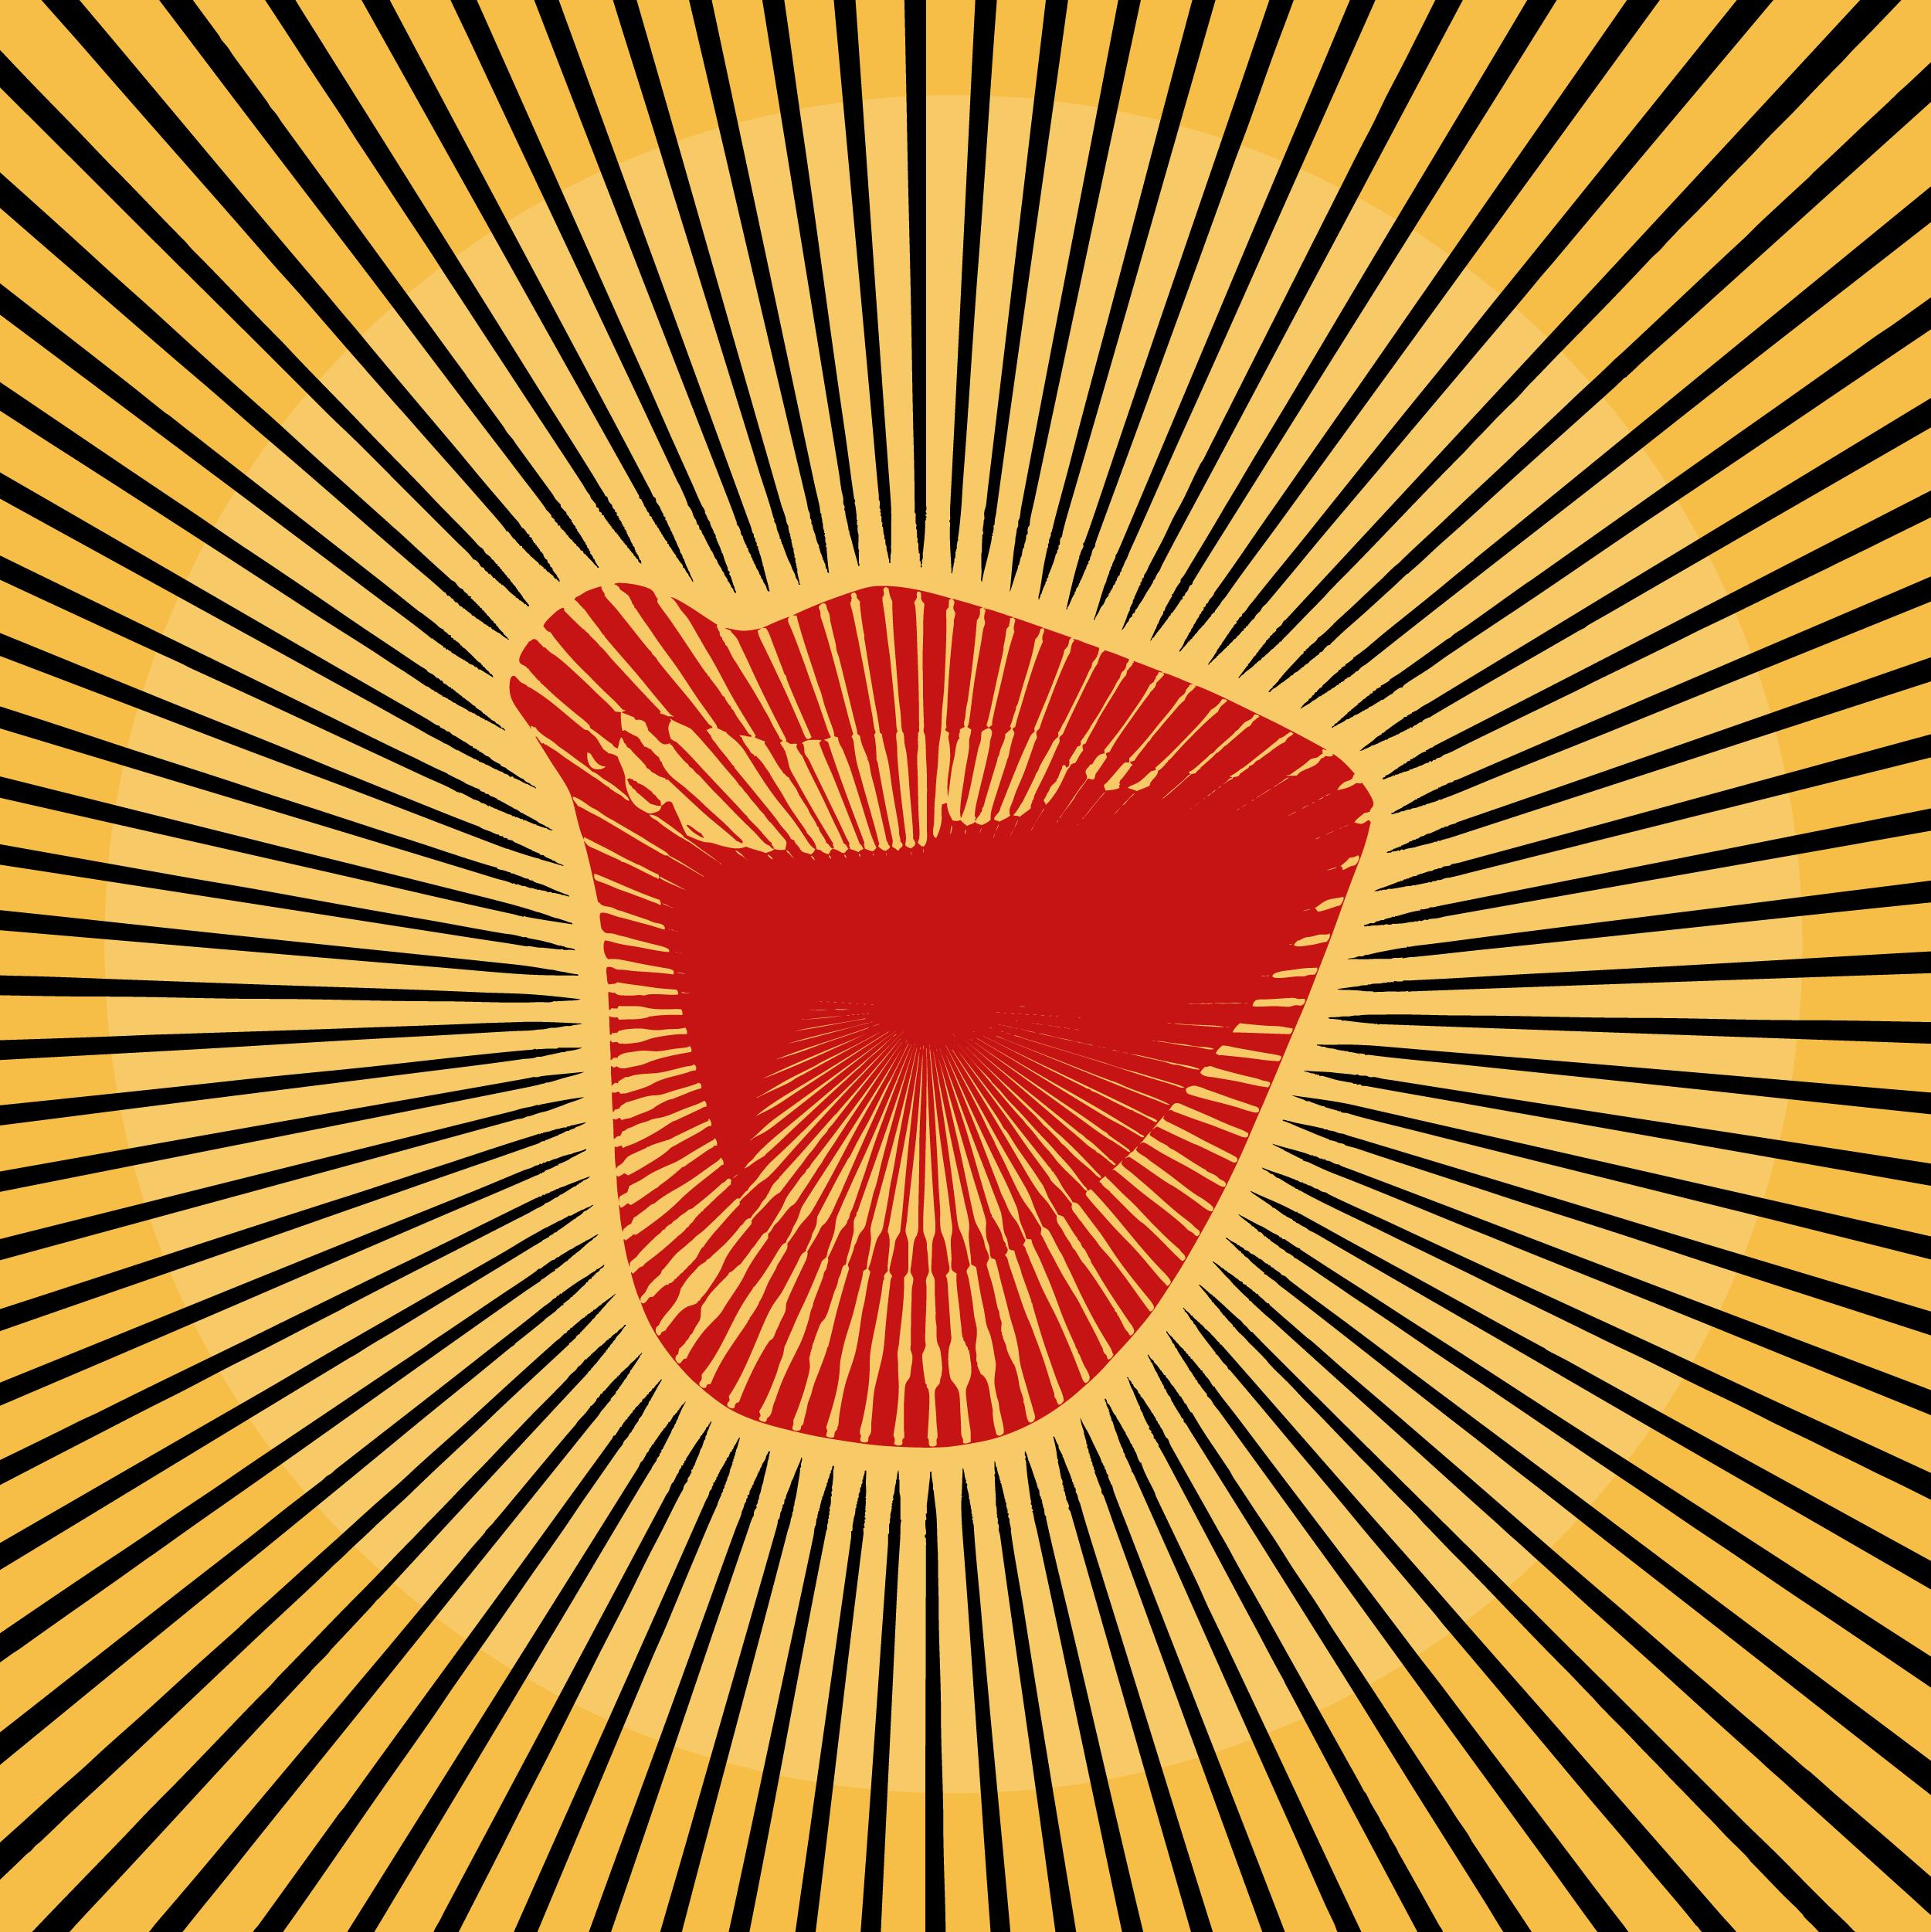 Blood x Music graphic